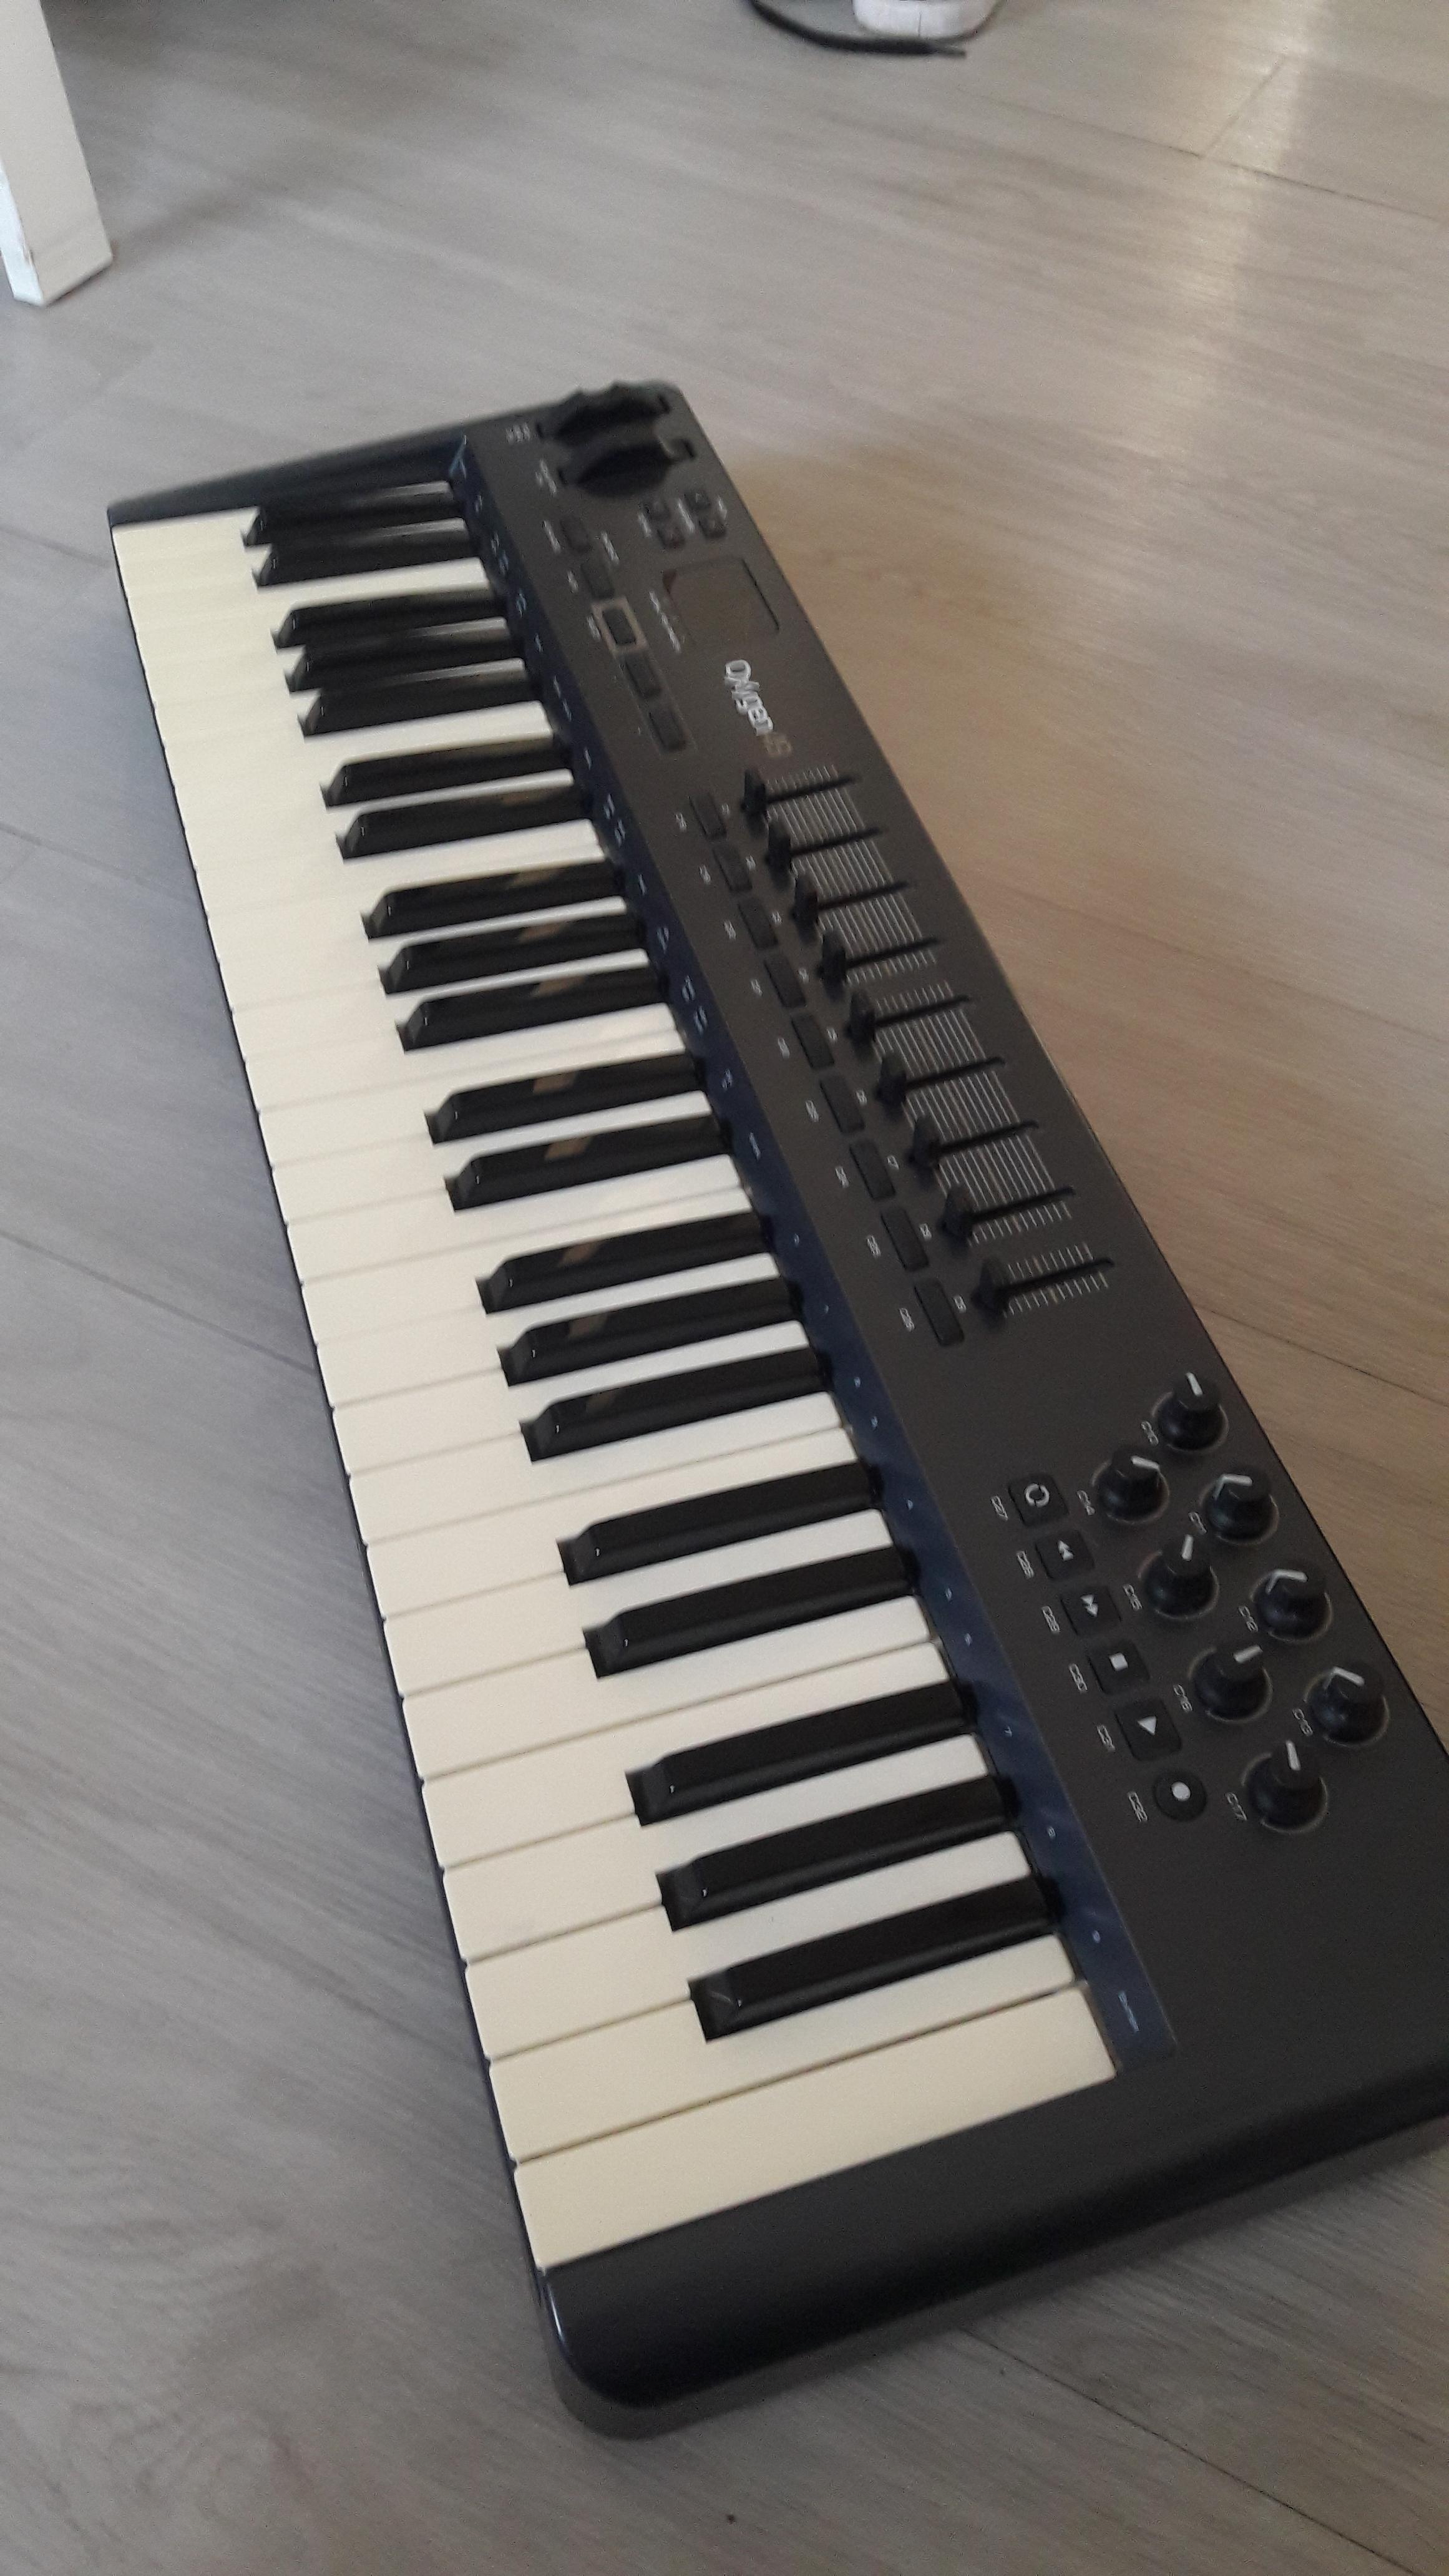 vend clavier midi m audio oxygen 49 ile de france. Black Bedroom Furniture Sets. Home Design Ideas